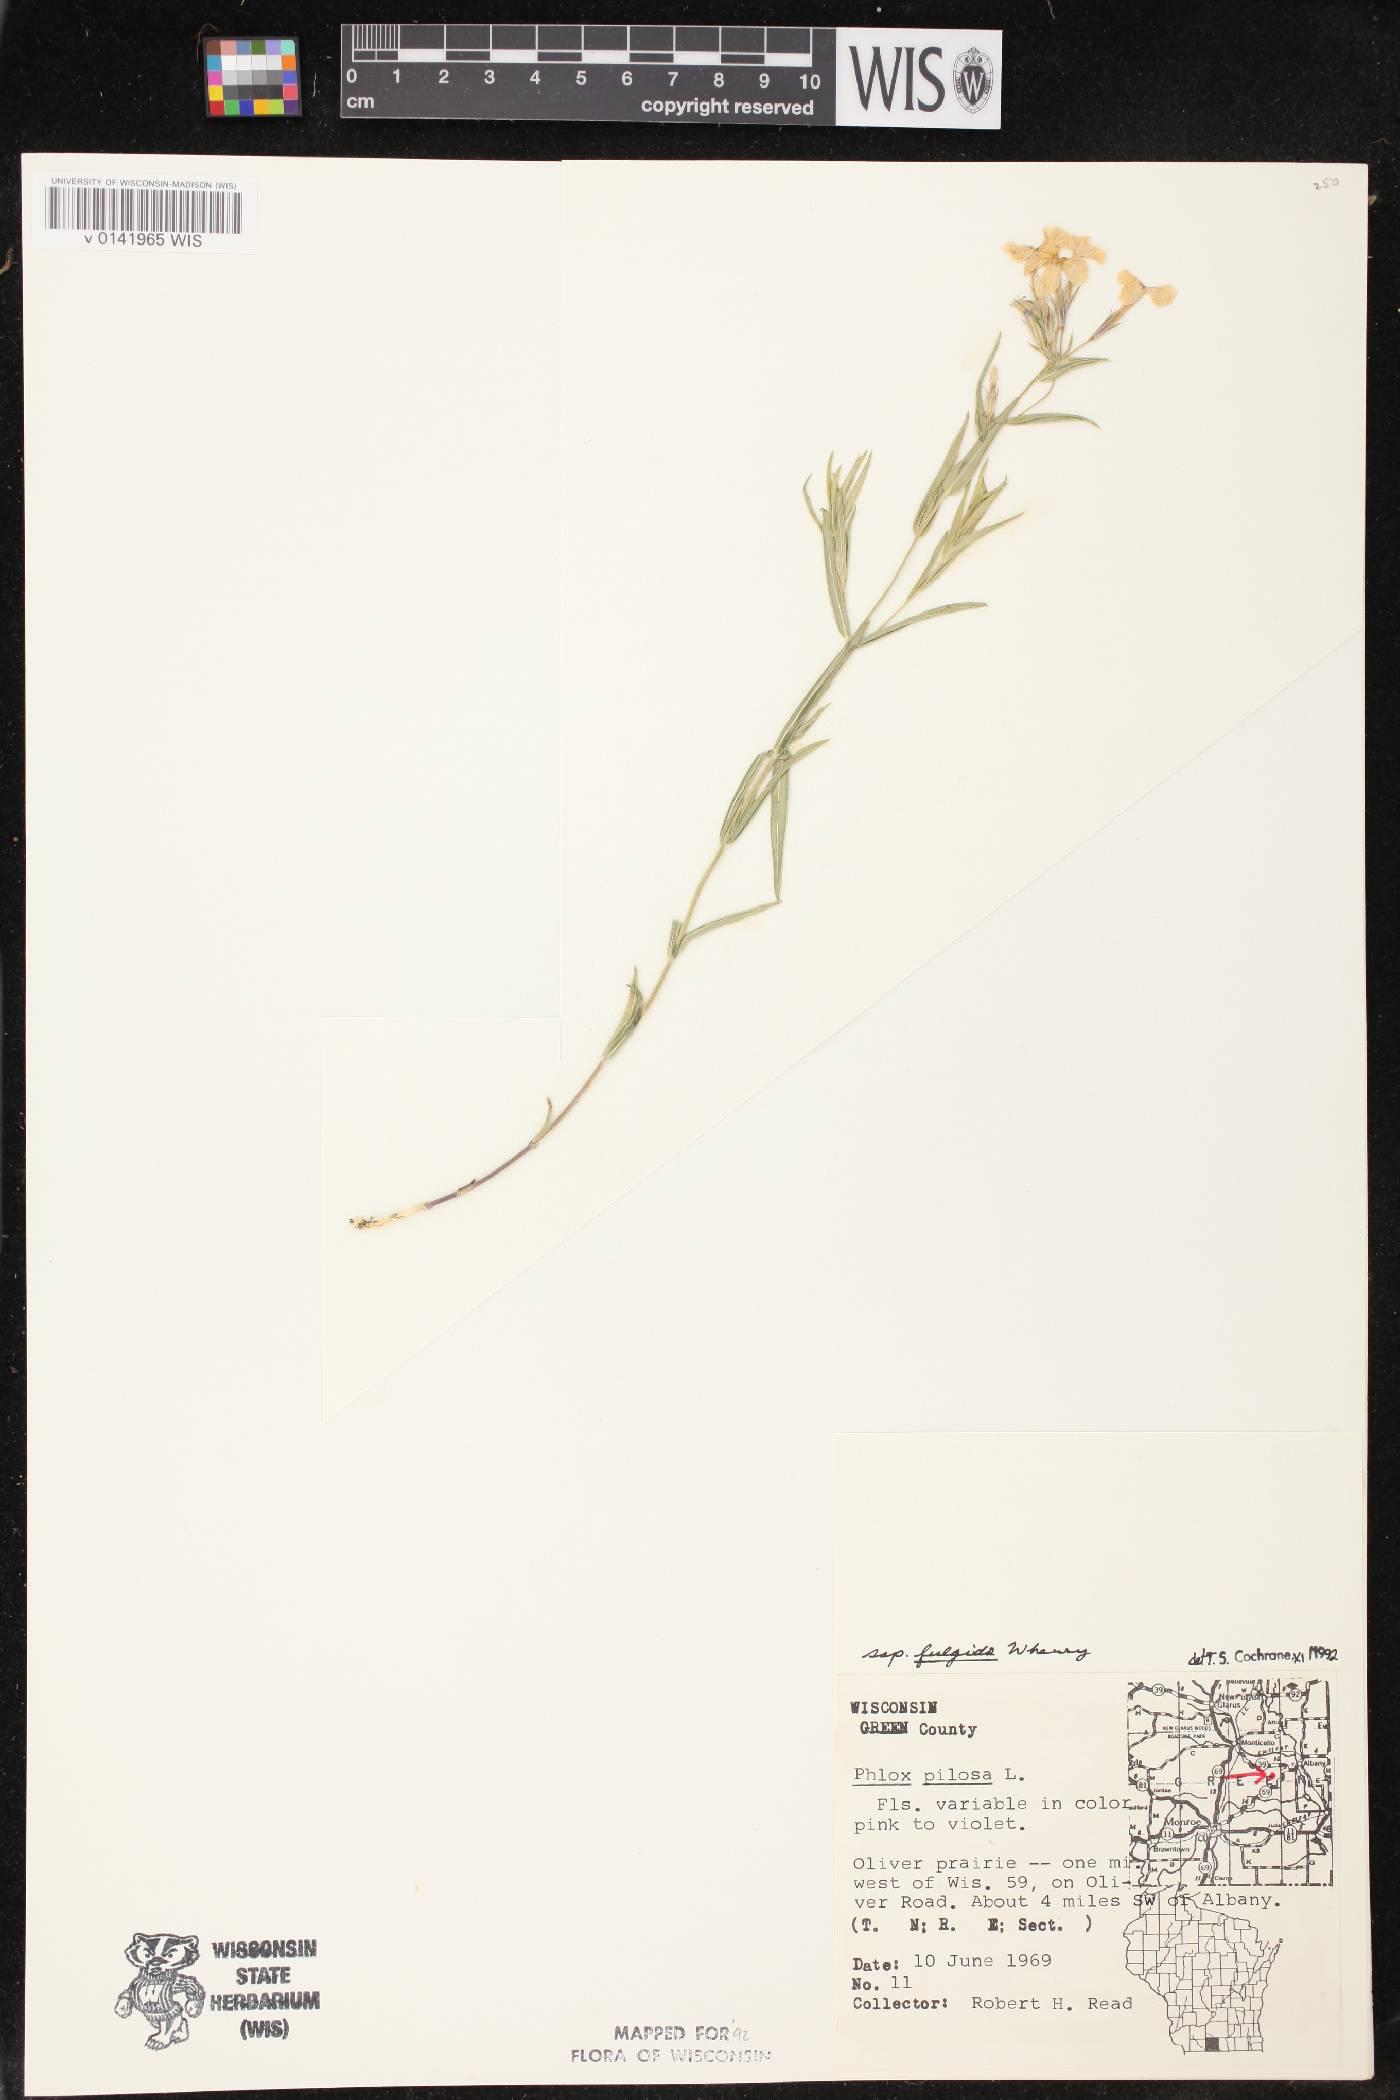 Phlox pilosa subsp. fulgida image